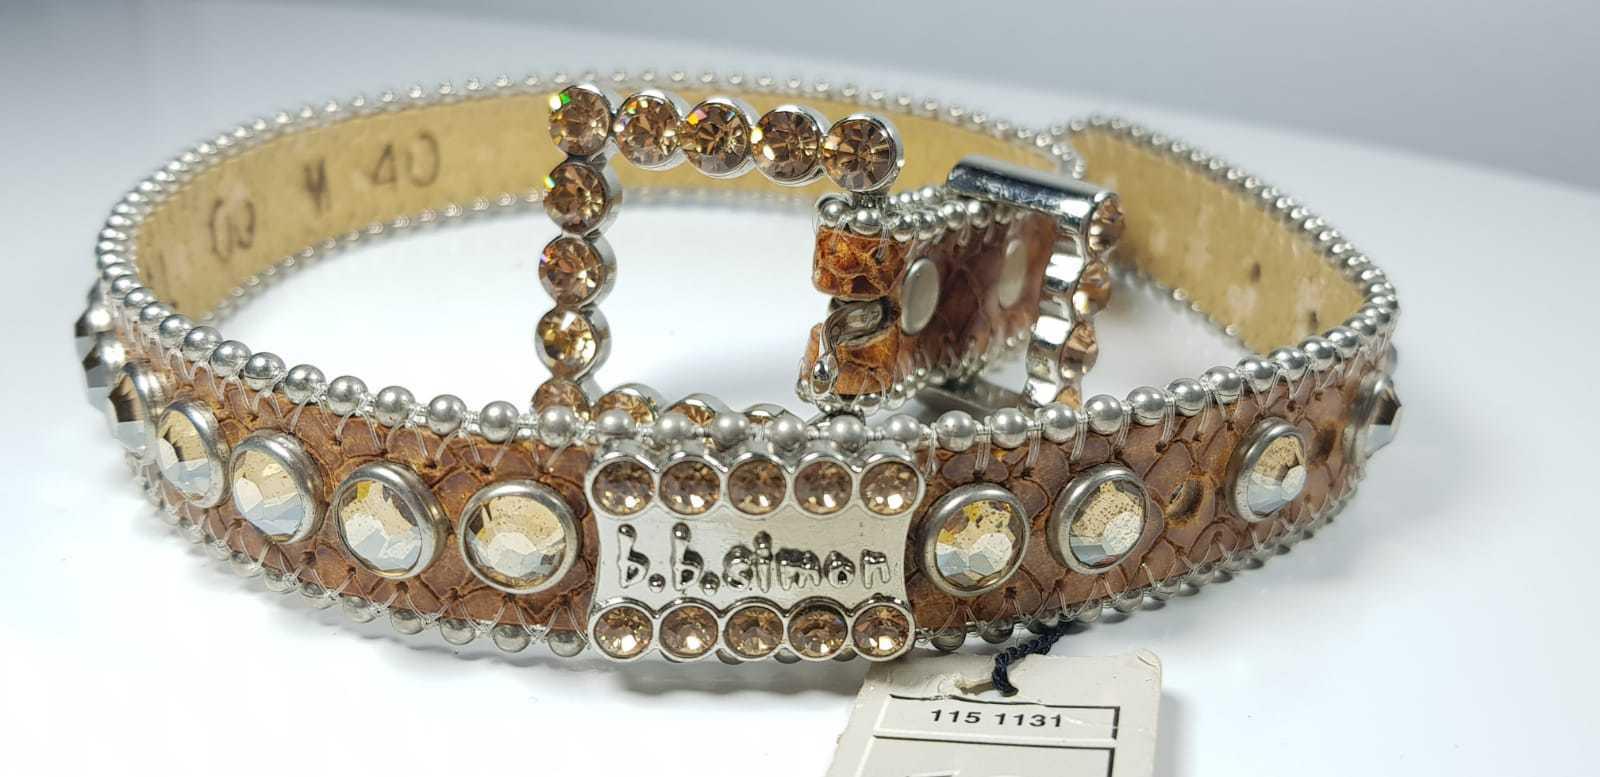 Crystallized  Swarovski stones lather belt for small dog